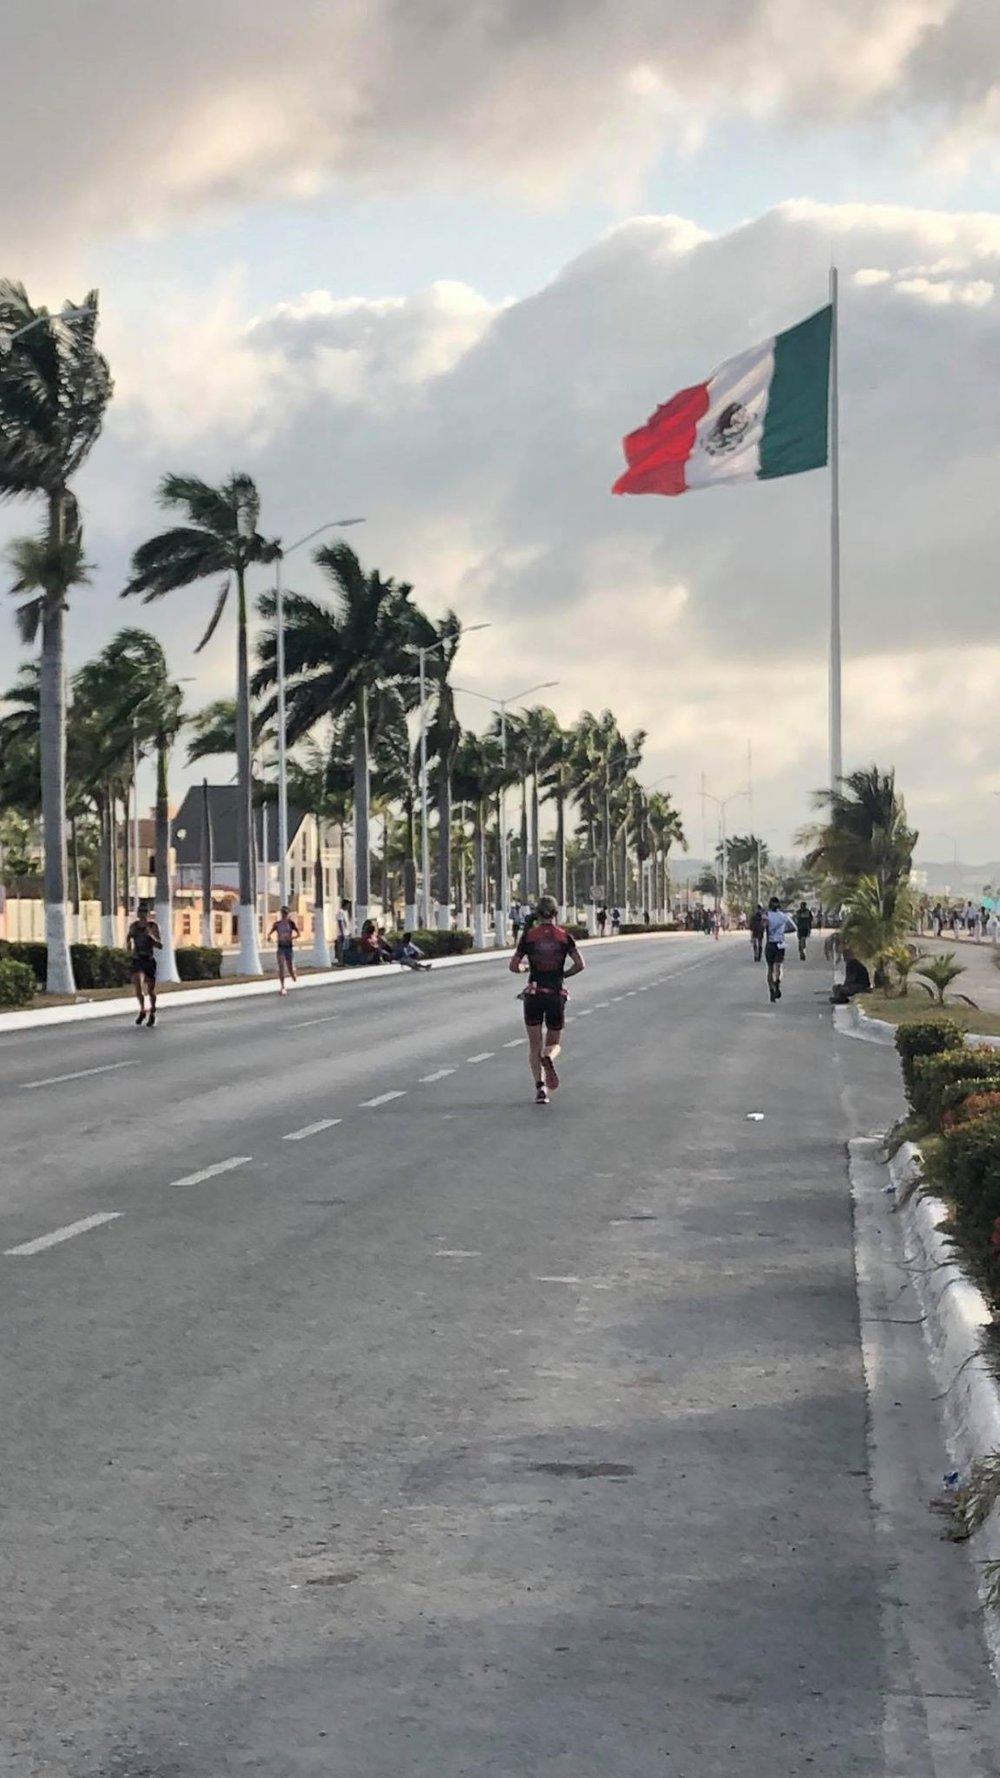 Coach_Terry_Wilson_Pursuit_of_The_Perfect_Race_IRONMAN_Campeche_Danielle_Dingman_10.jpg